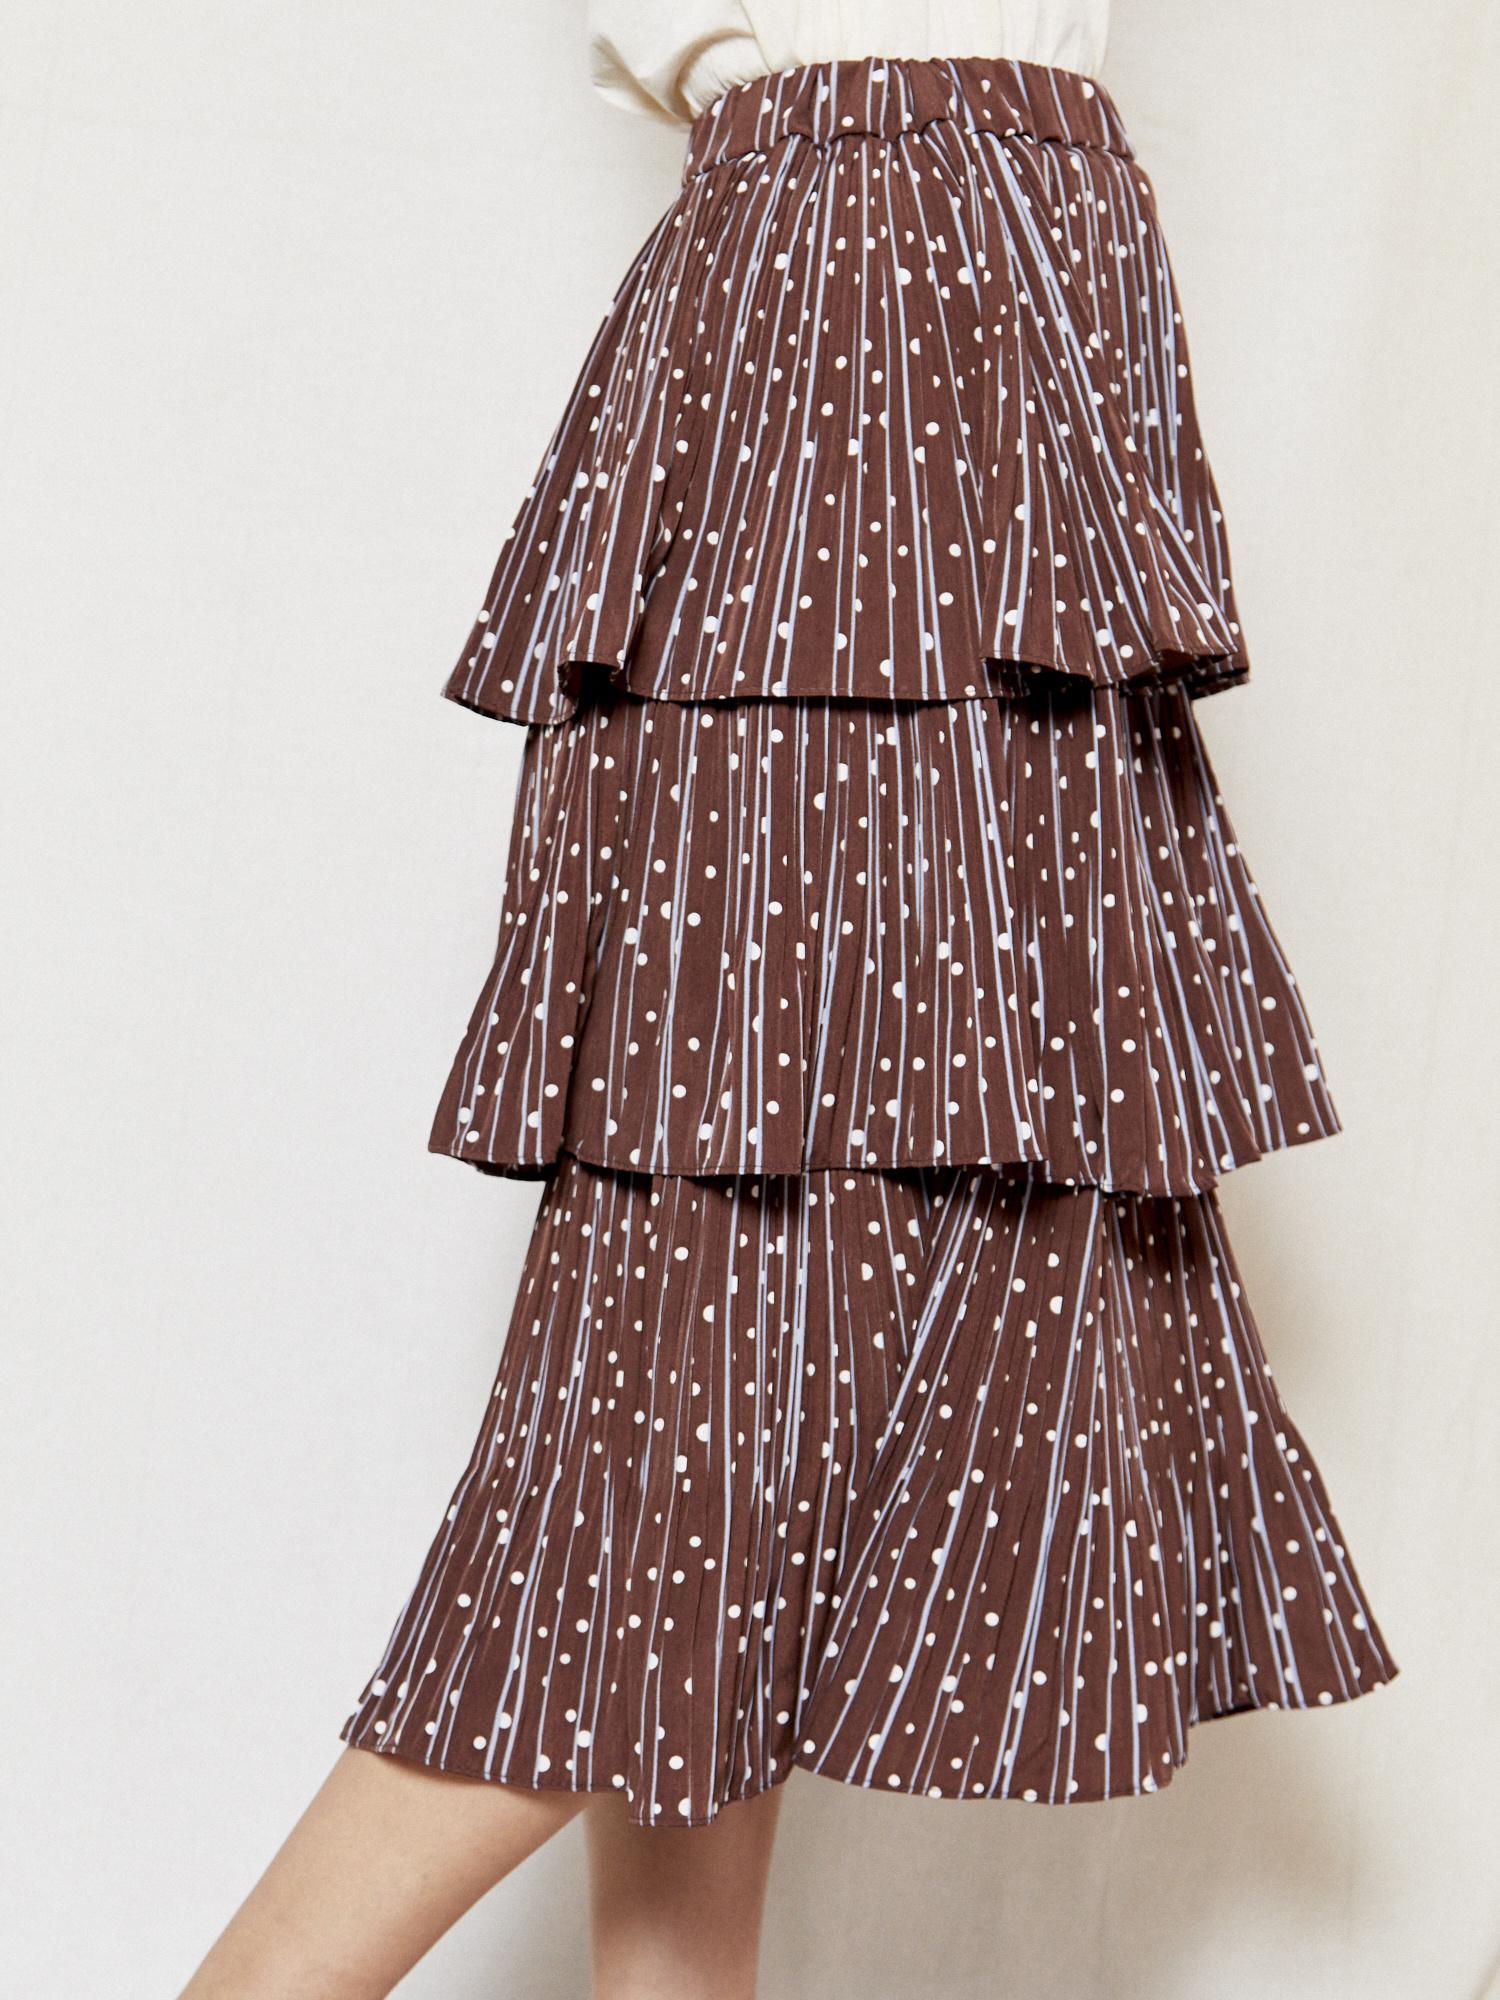 Erica Anna Brown Printed Skirt